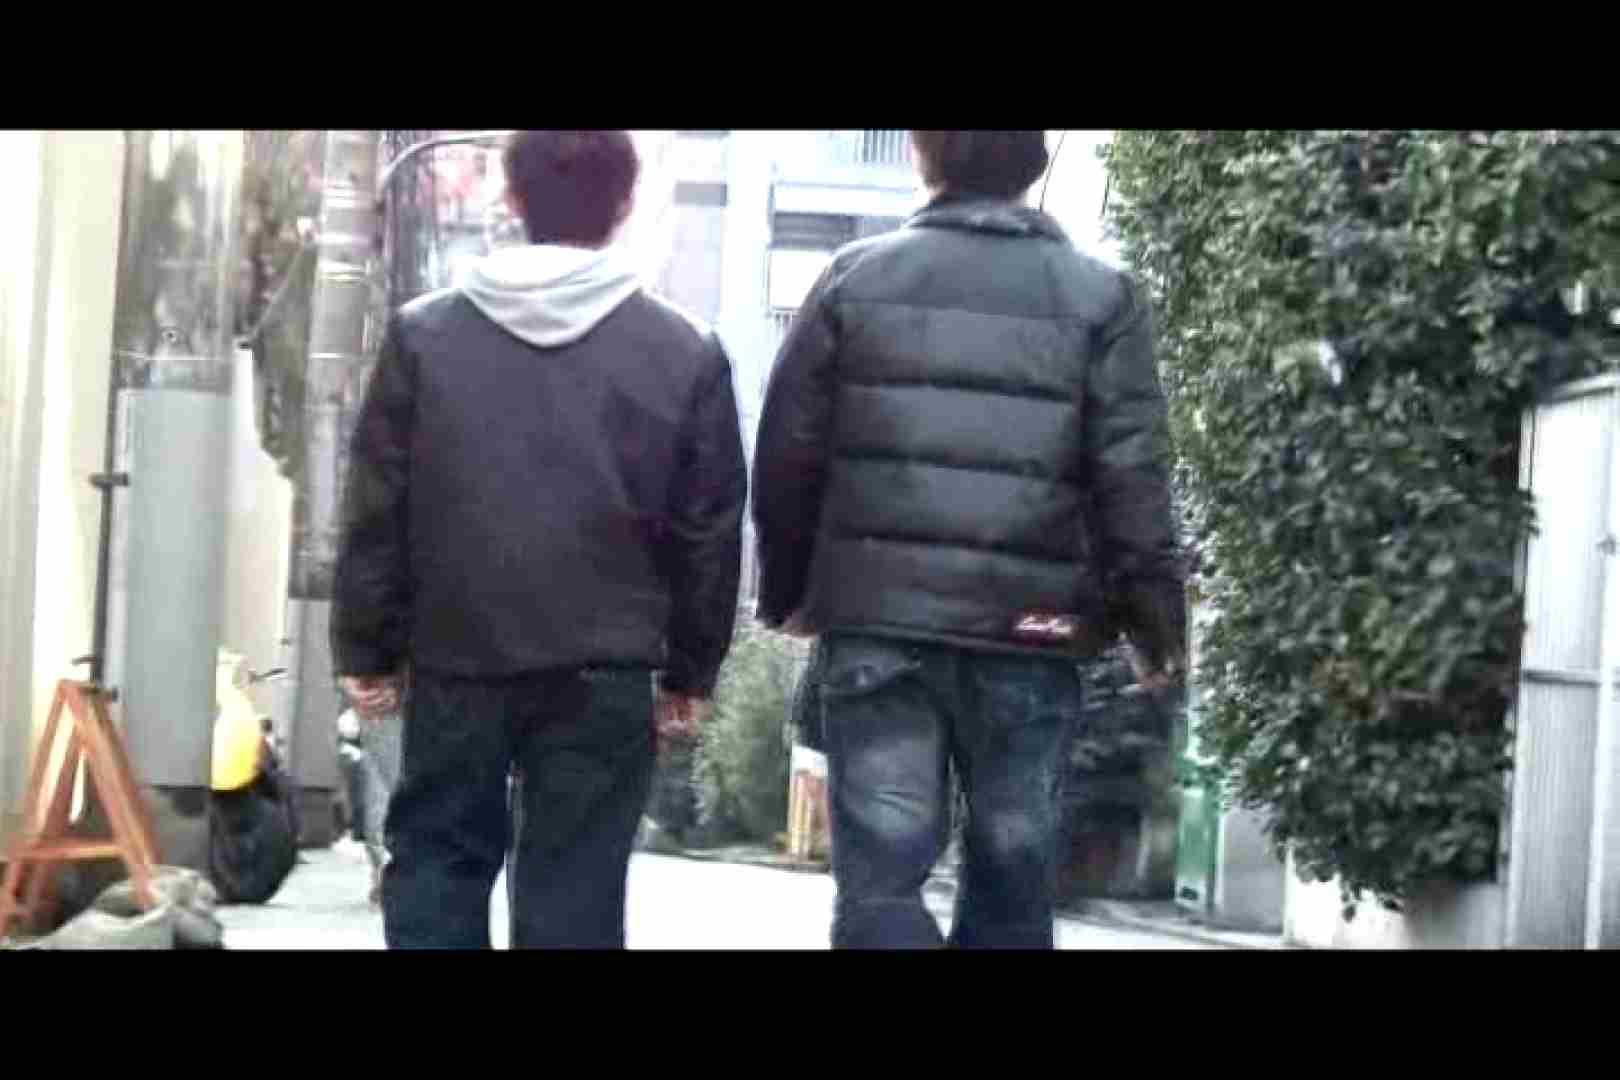 Bistro「イケメン」~Mokkori和風仕立て~vol.01 イケメン  89pic 29